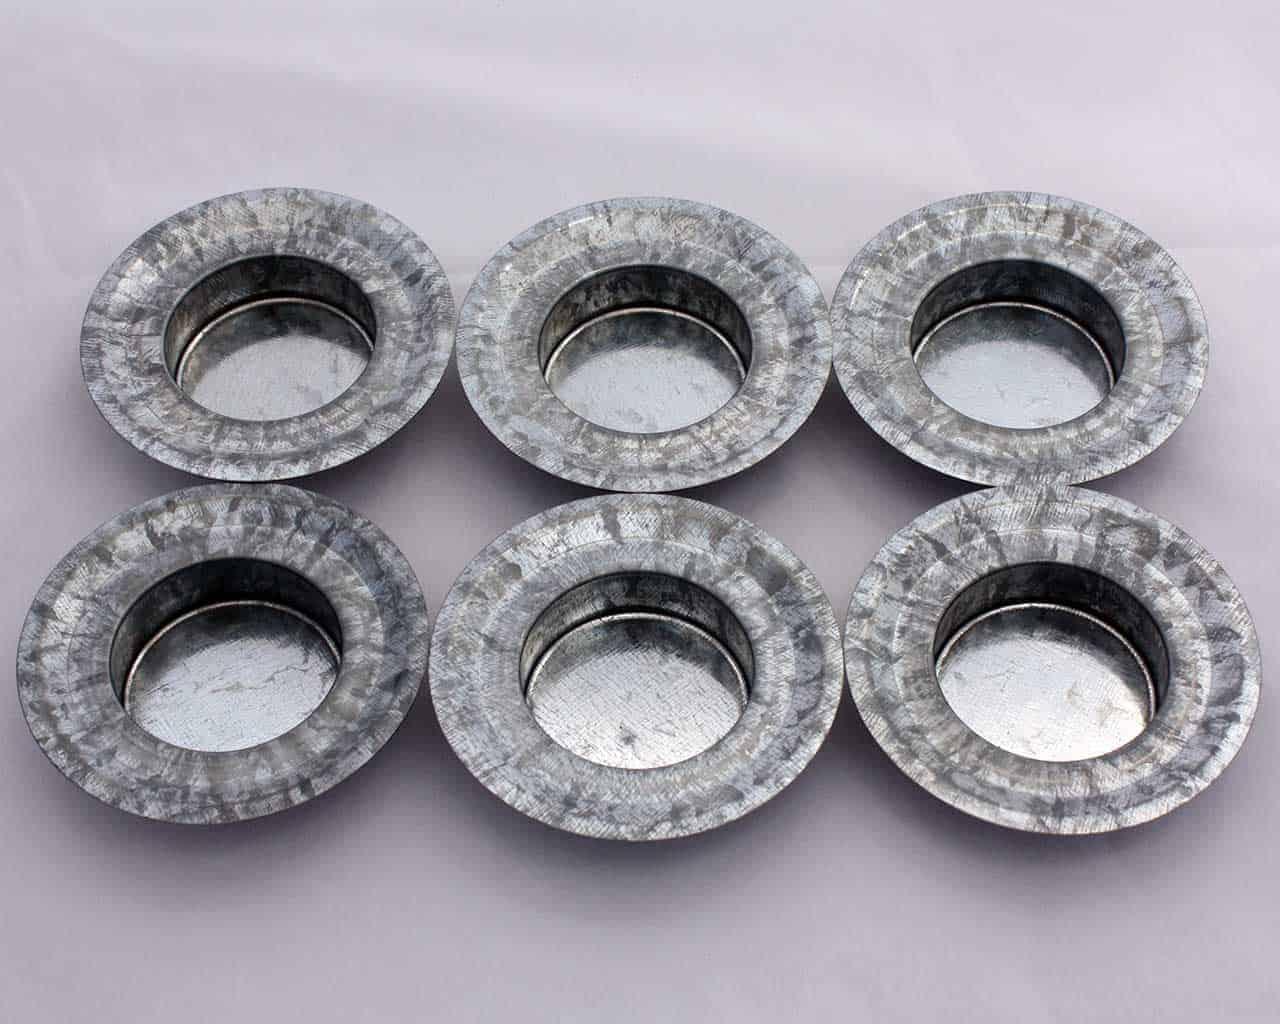 tea light votive candle holder galvanized metal insert for regular mouth mason jars 6 pack